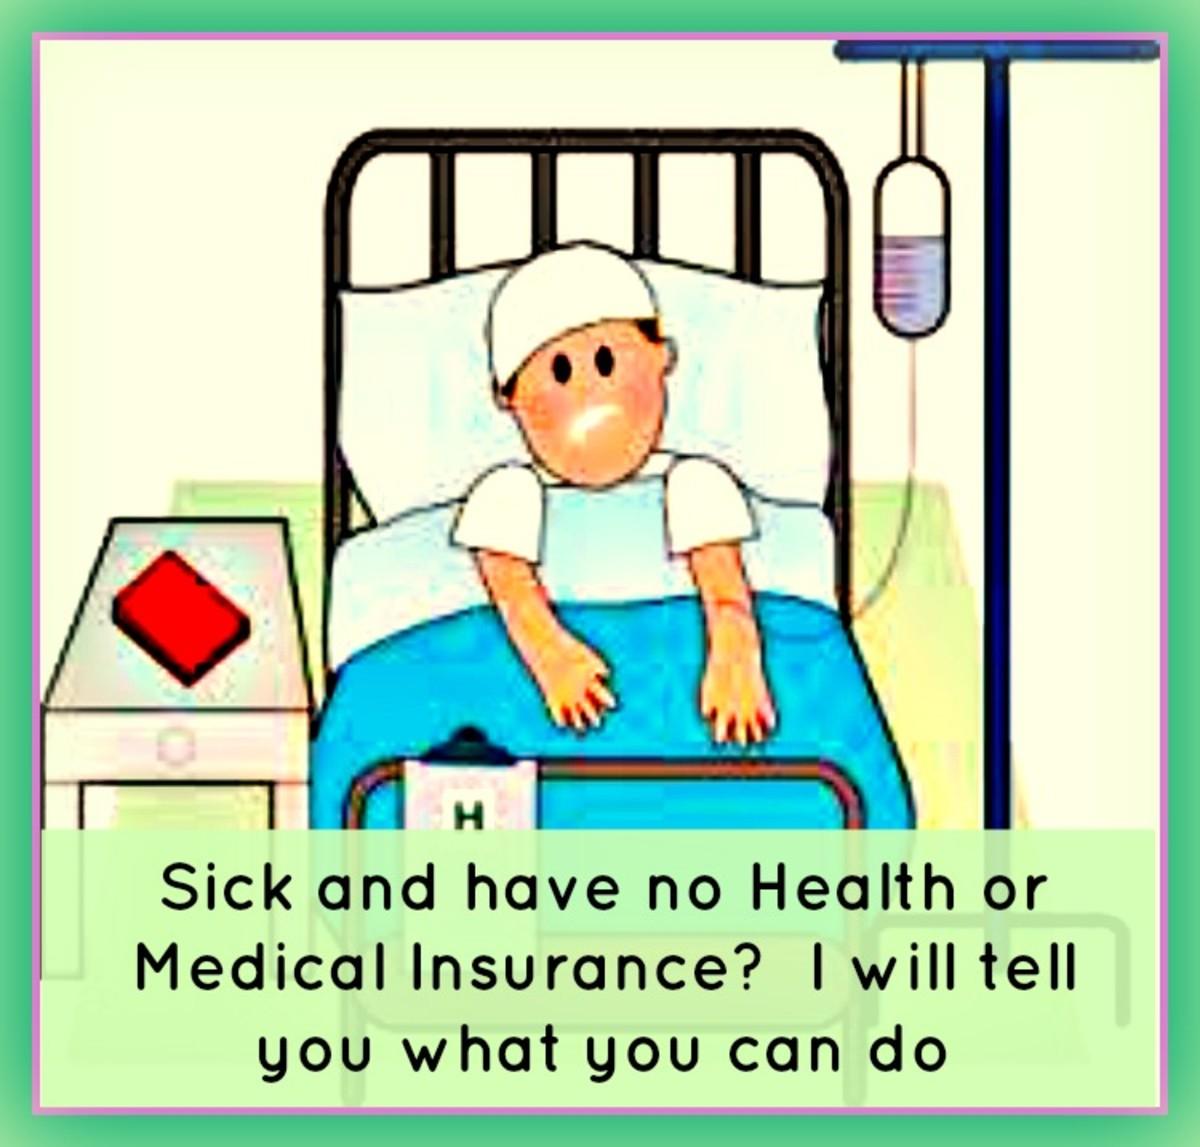 how to make sick go away